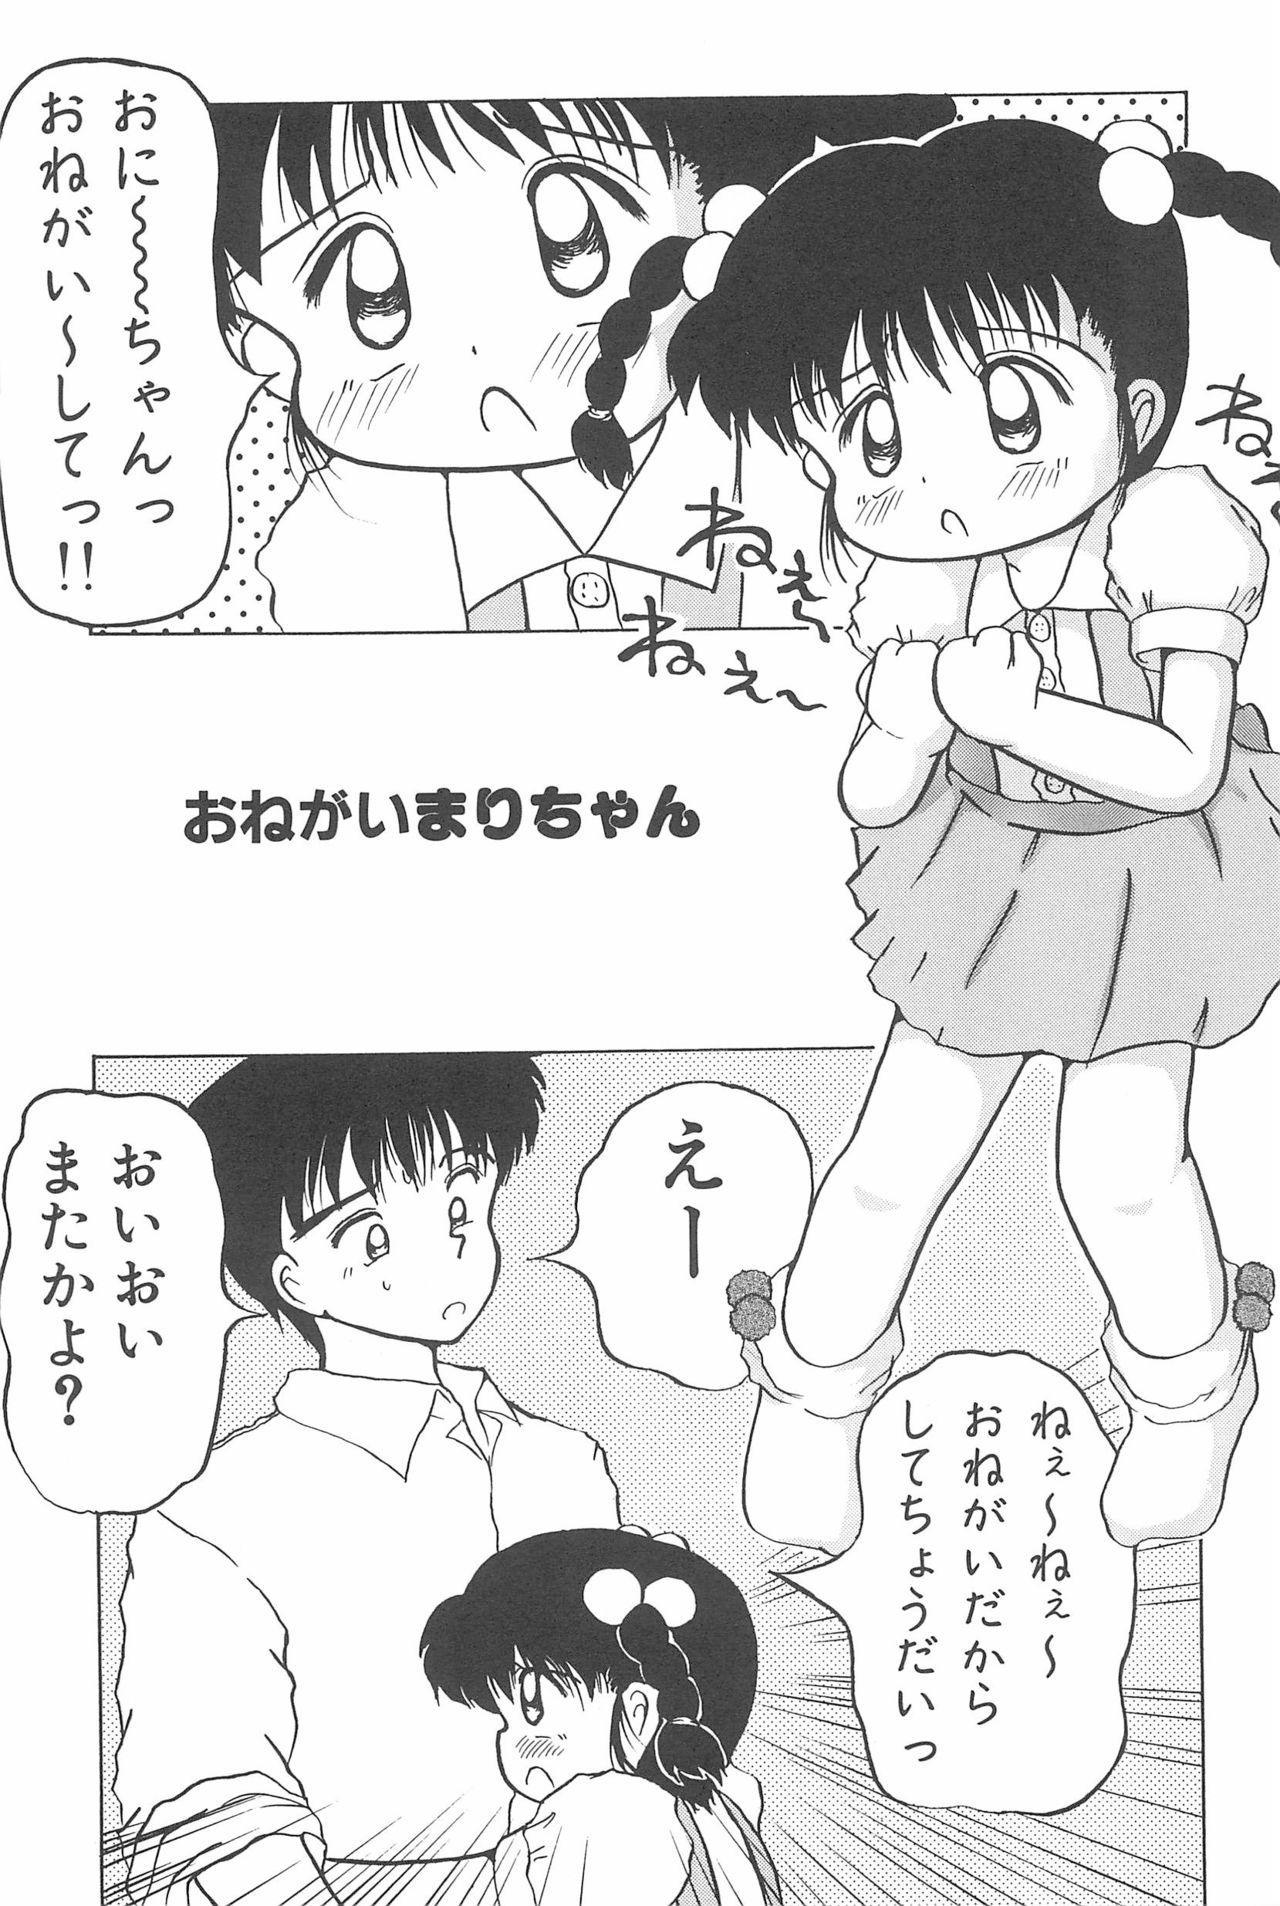 Aoi Shojokyuu 142